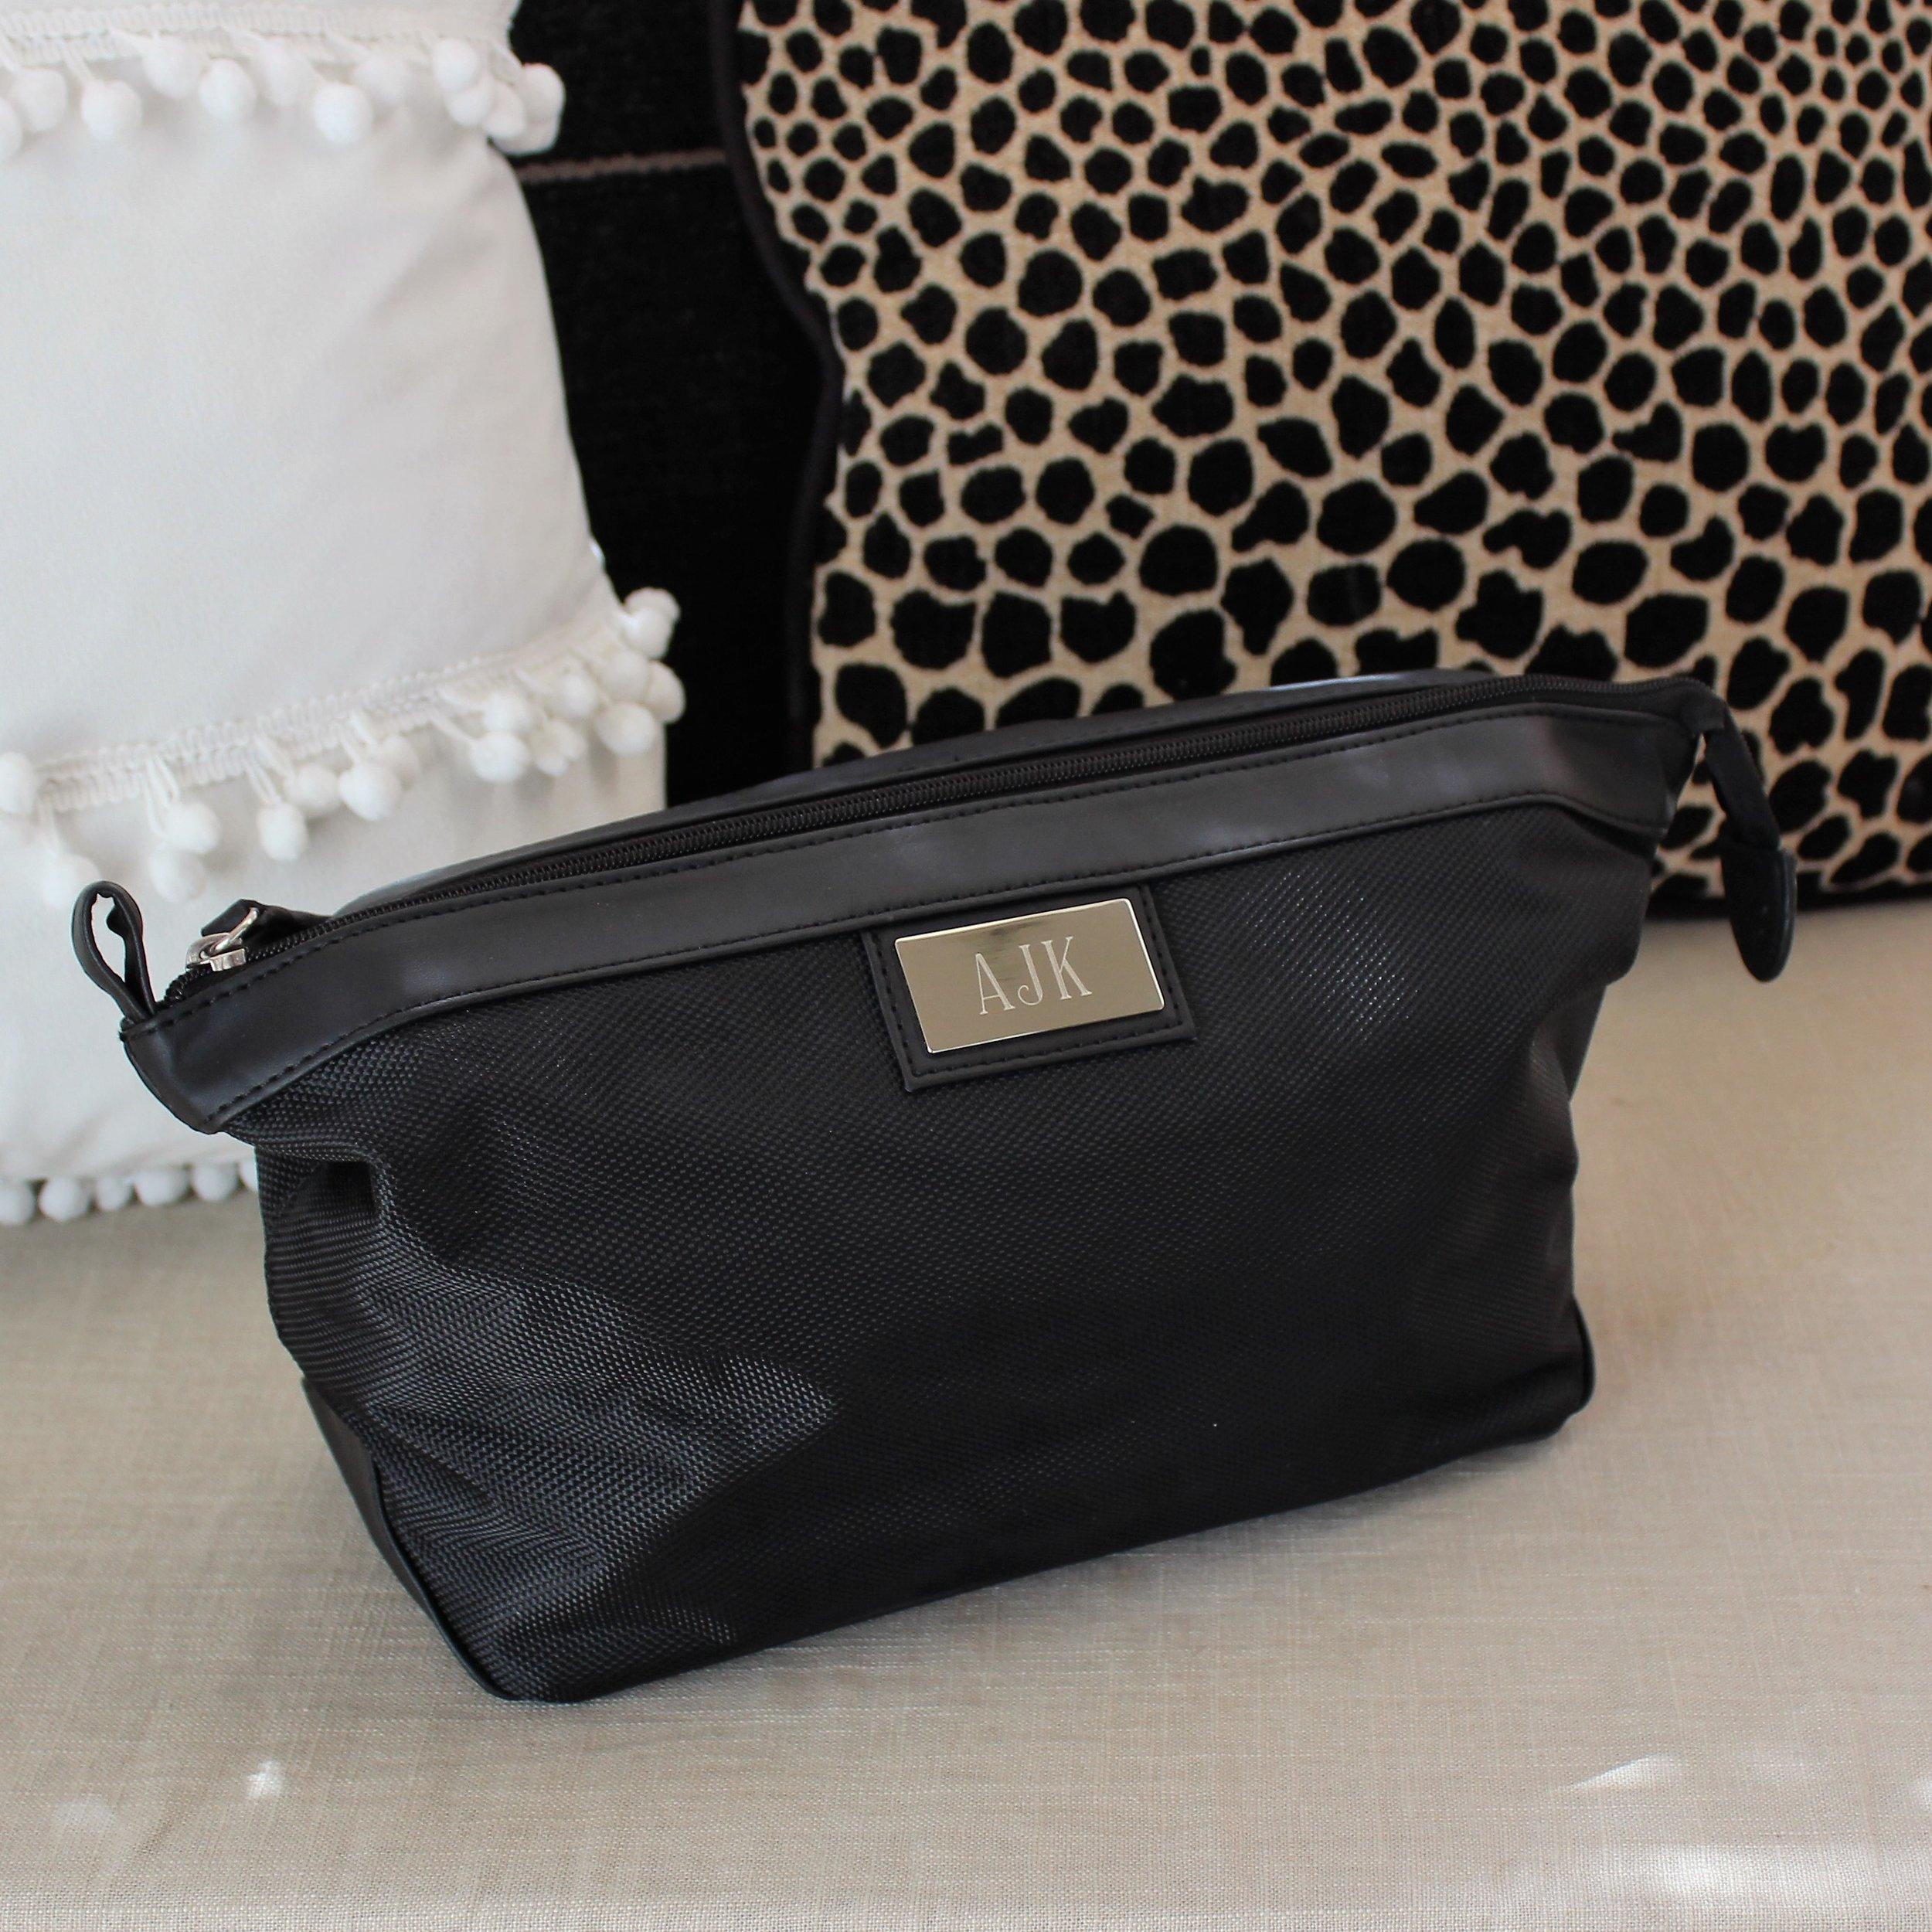 c93909f861 Black Nylon And PVC Shaving Travel and Shaving Bag